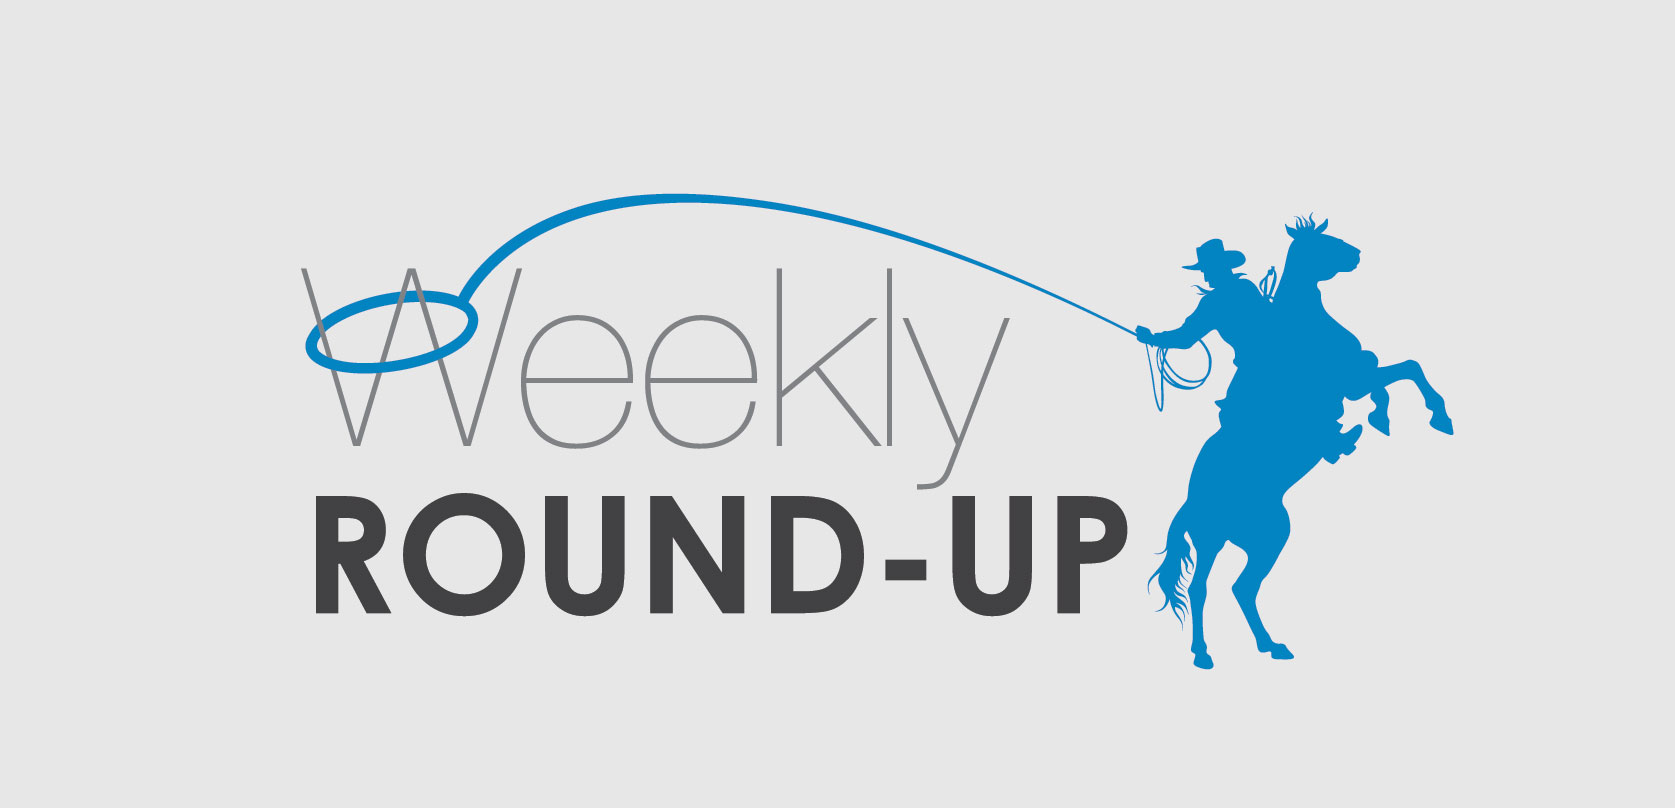 weekly roundup, change blog post, communication blog, best of blog posts, david grossman